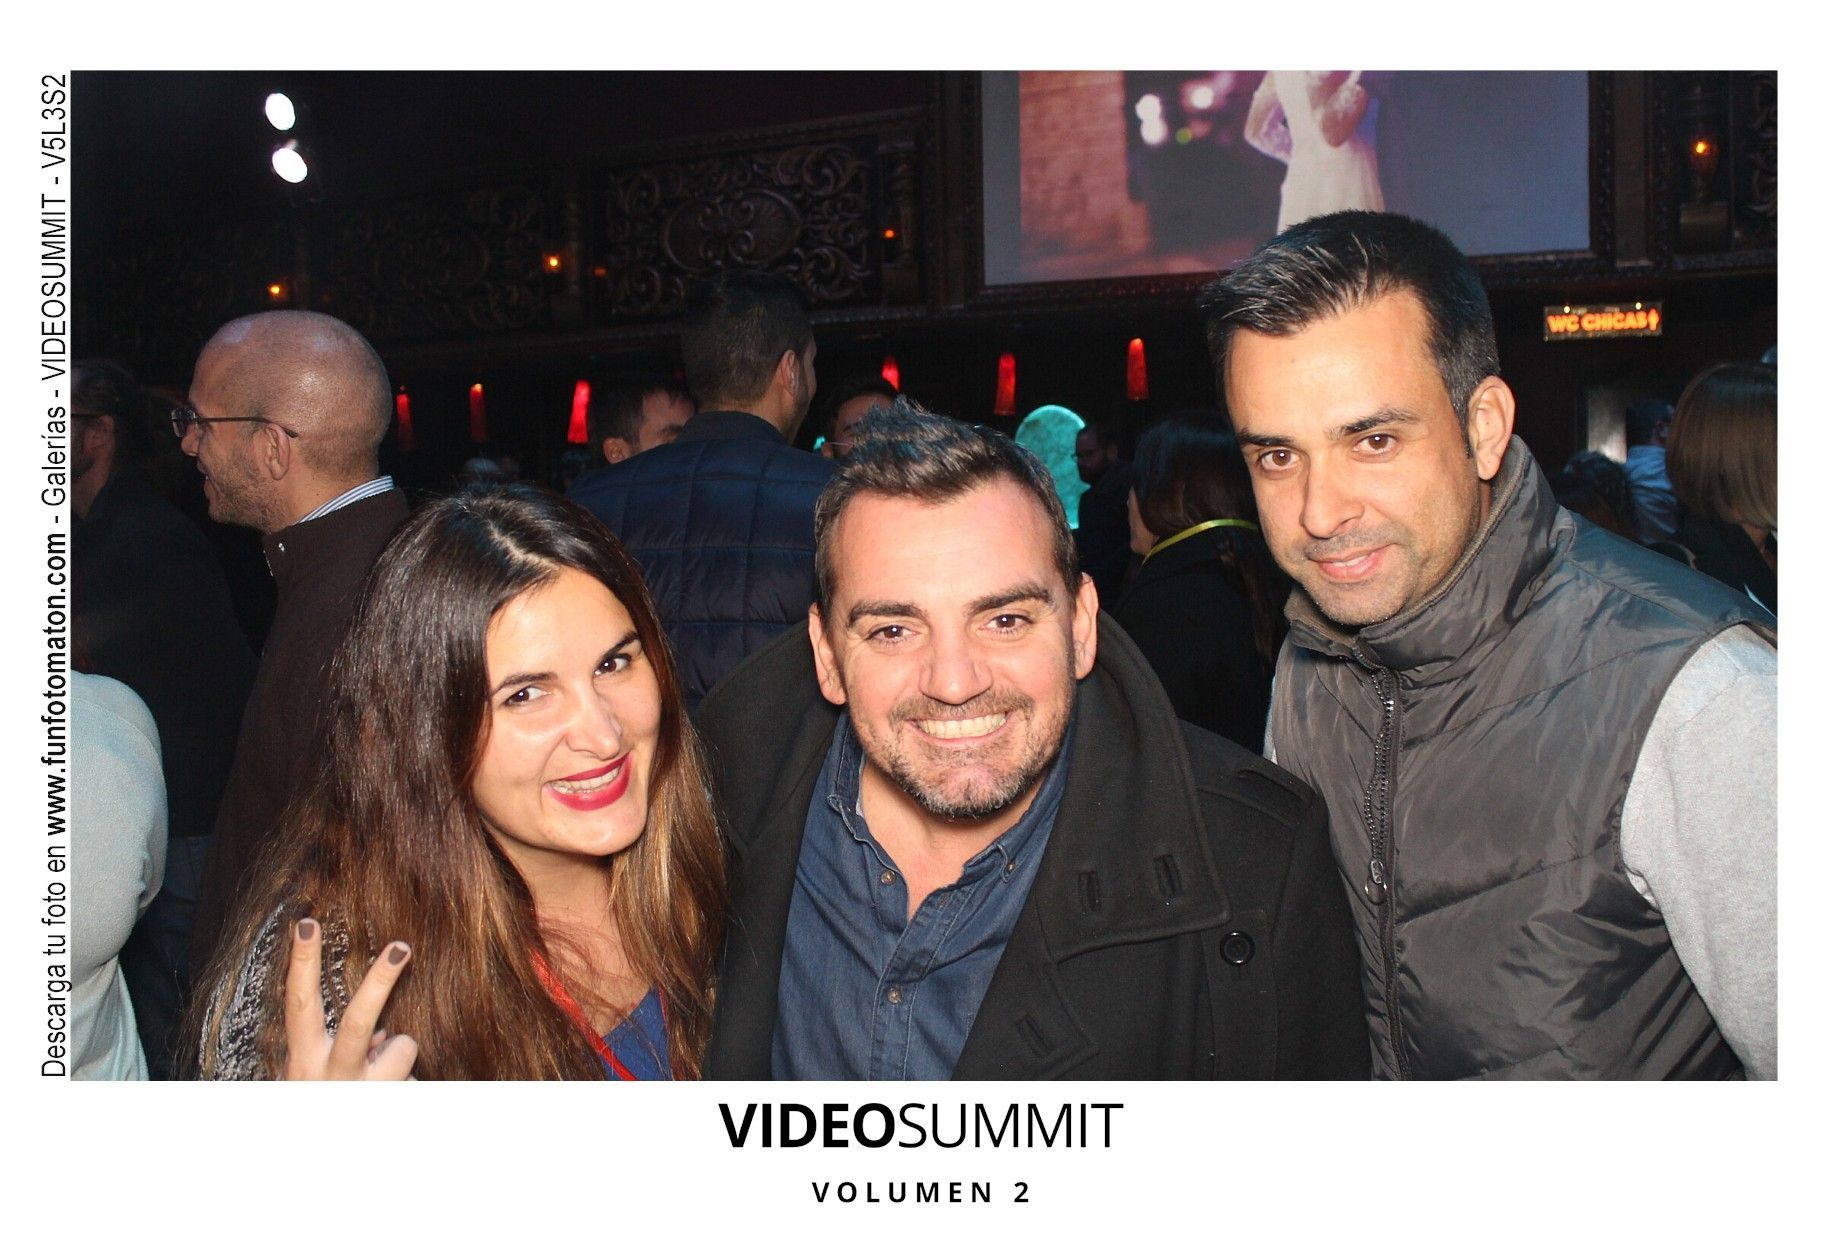 videosummit-vol2-club-party-040